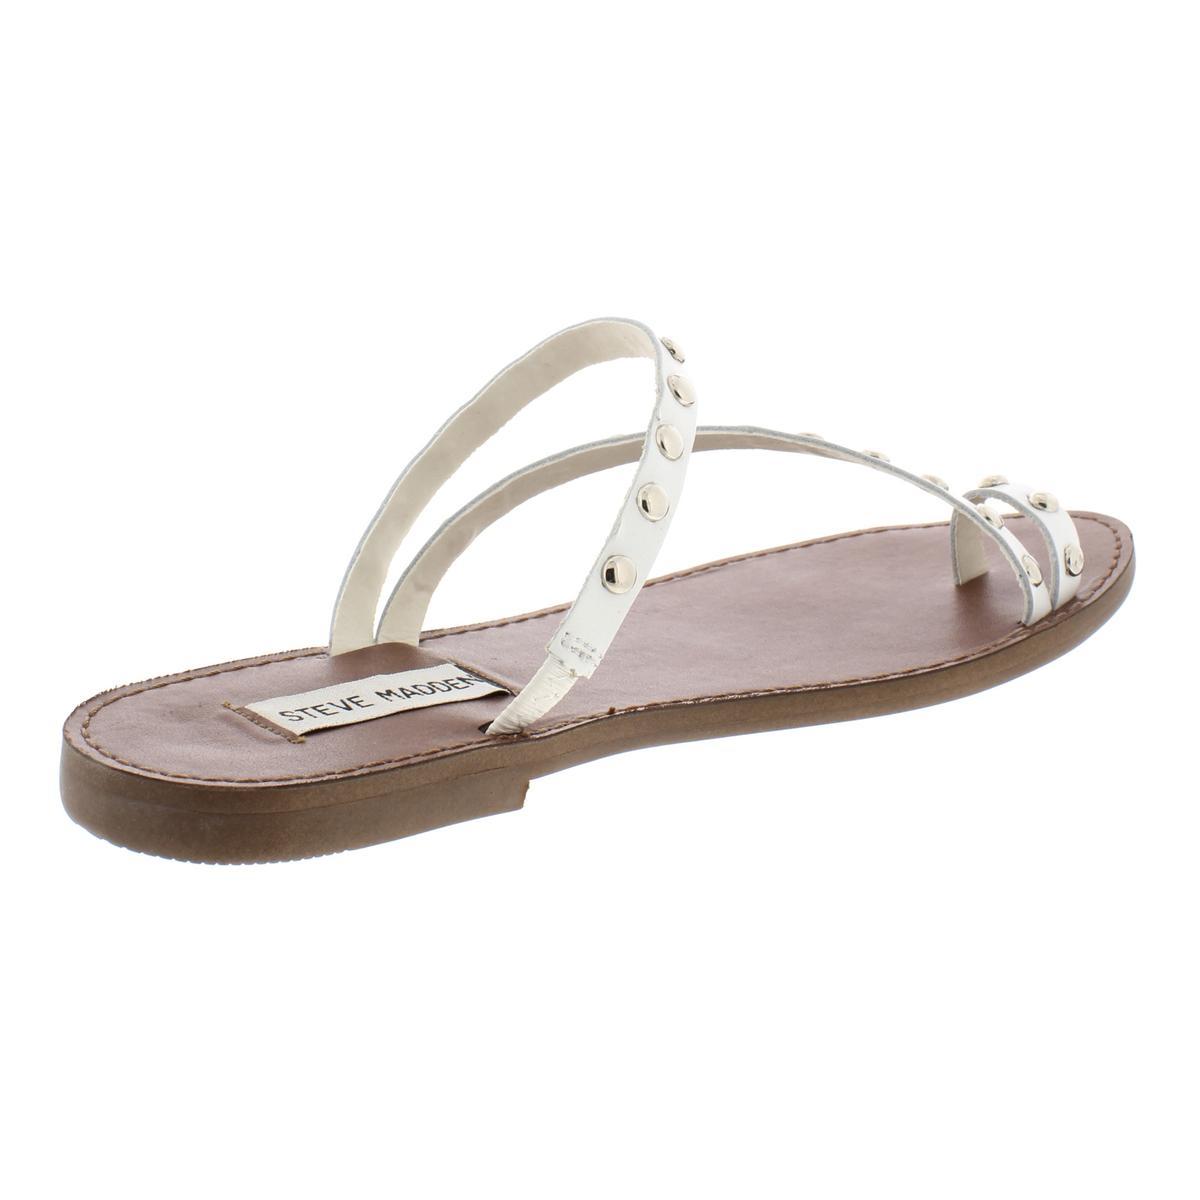 Steve Madden Womens Daria Leather Studded Toe Loop Flat Sandals Shoes BHFO 5938